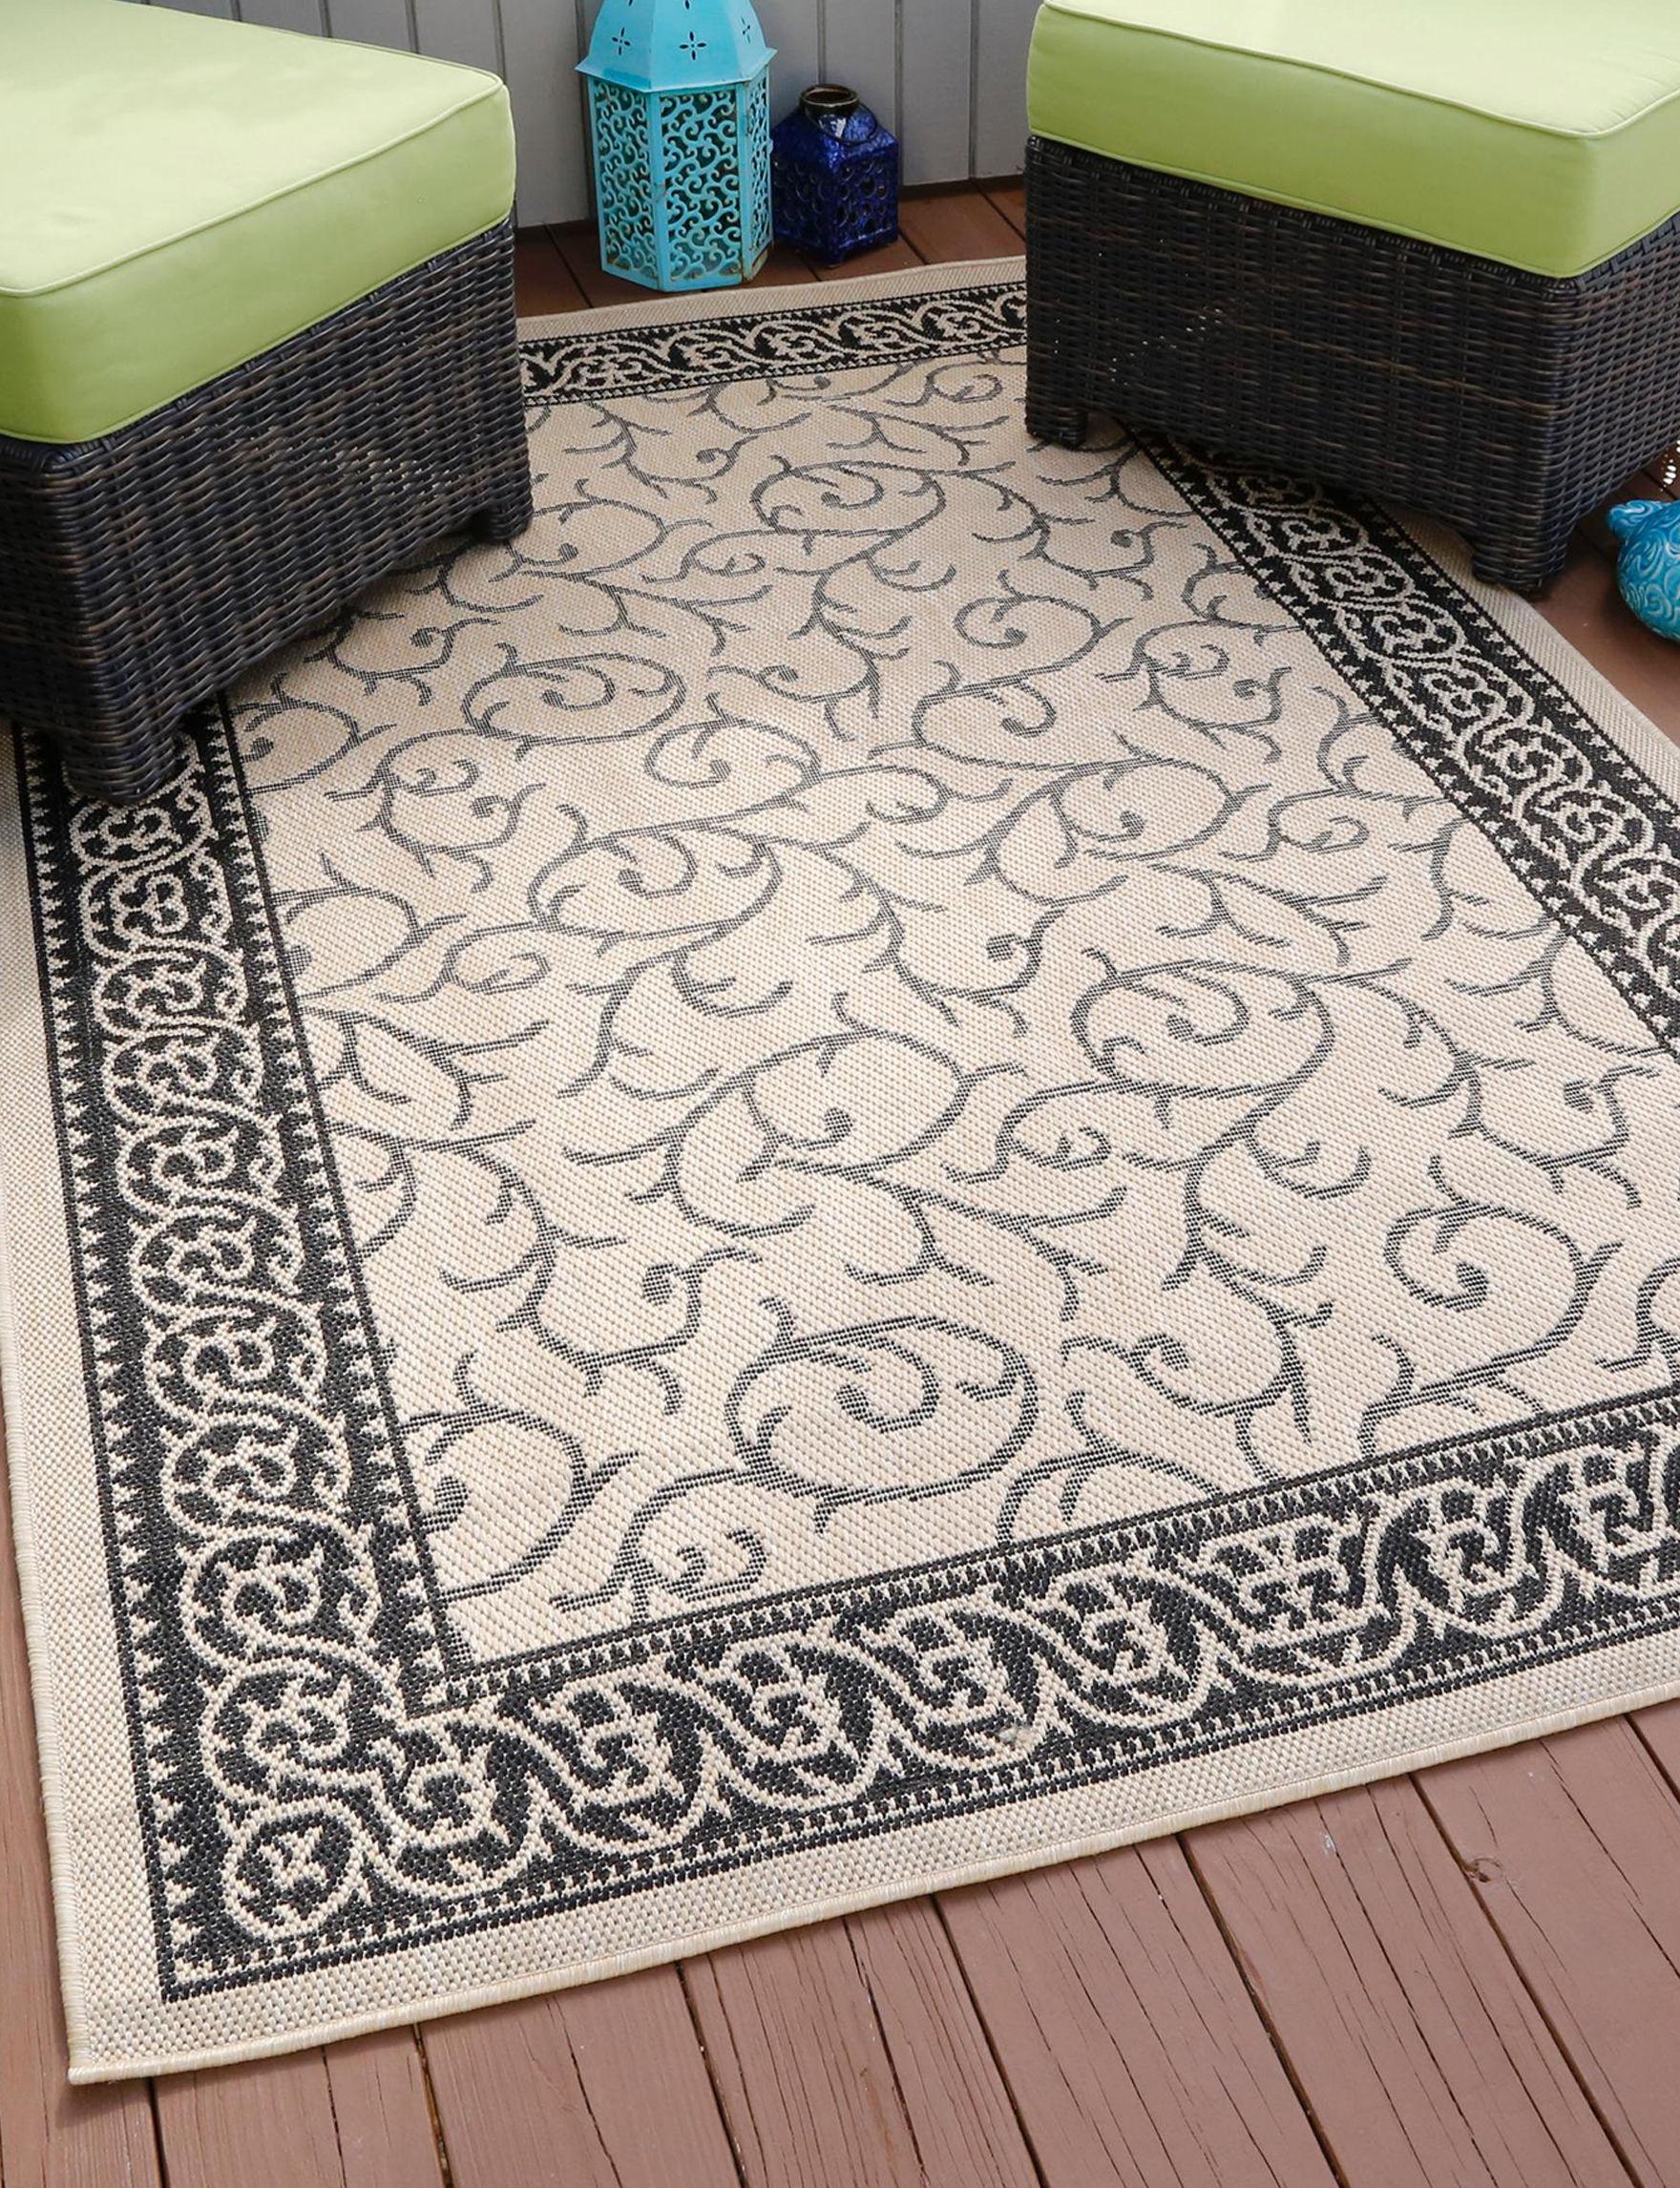 Lavish Home Black / Cream Area Rugs Rugs